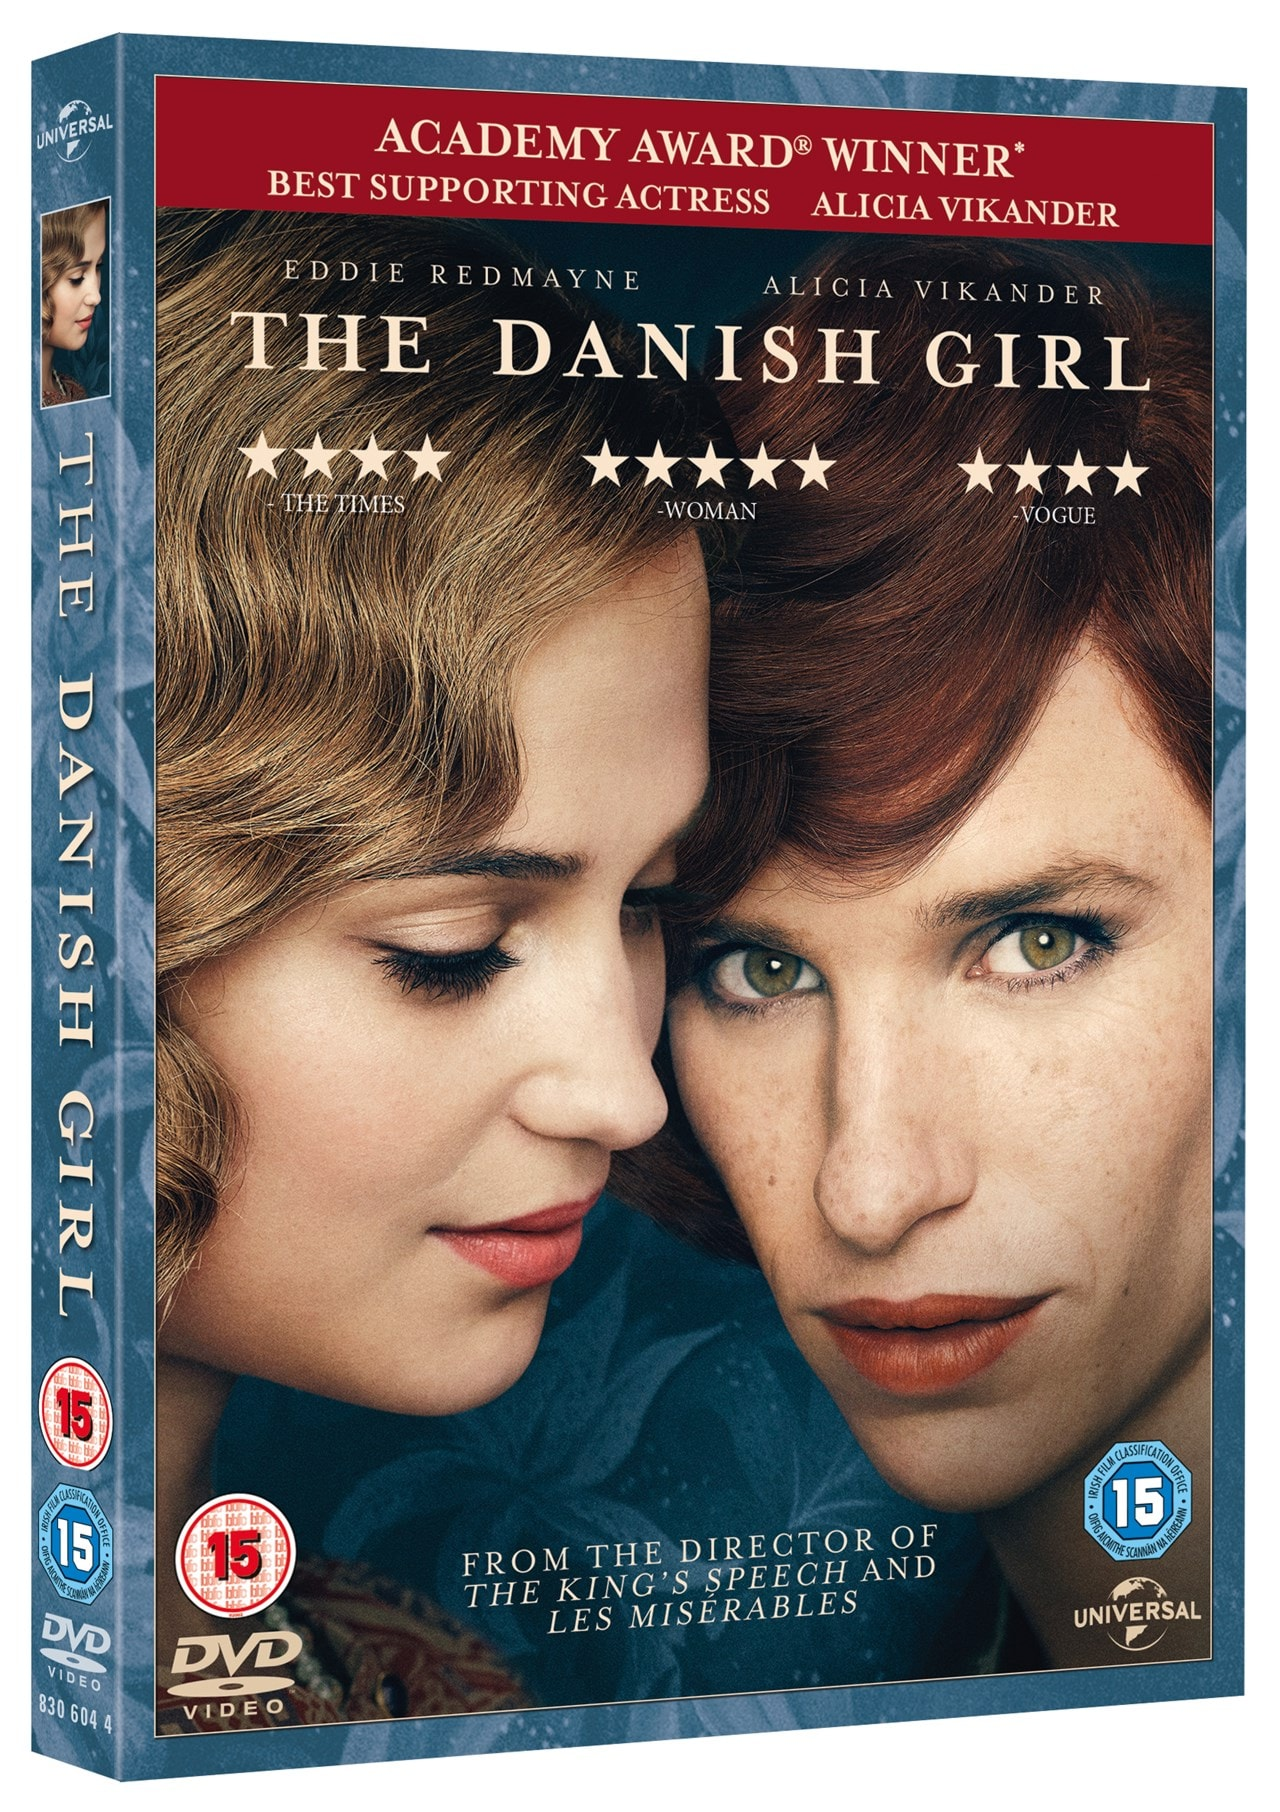 The Danish Girl - 2